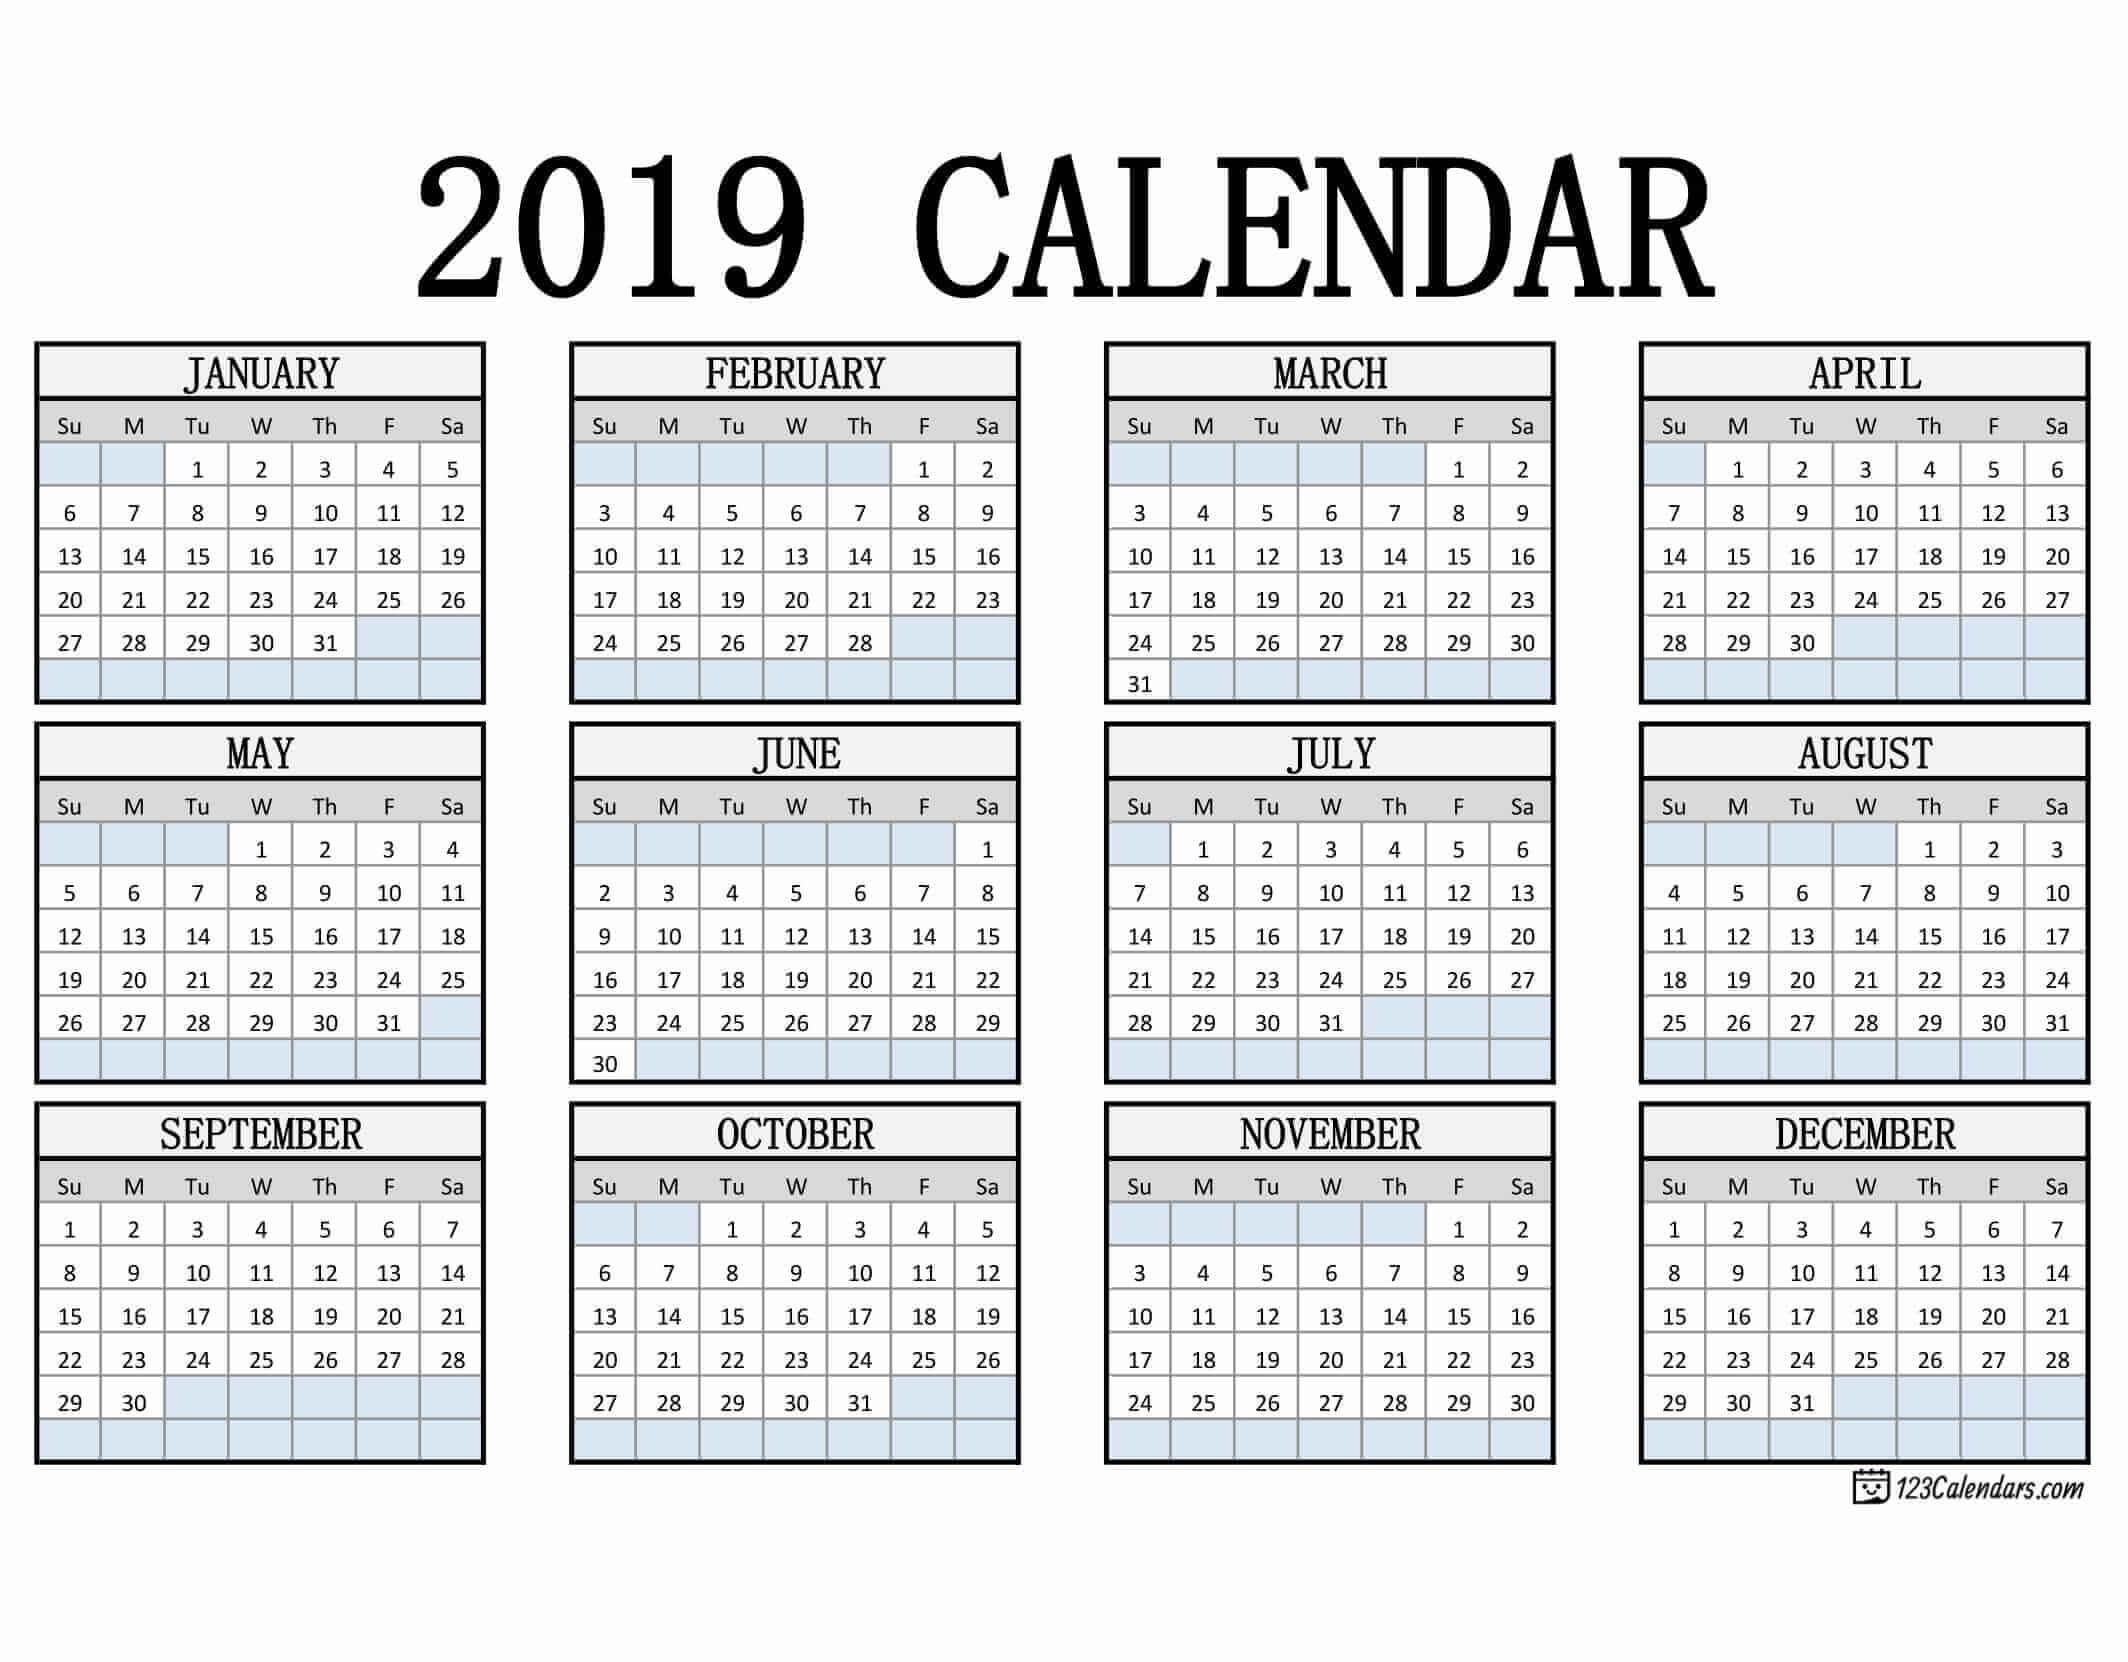 2019 Calendar Printable Template Free Printable 2019 Calendar